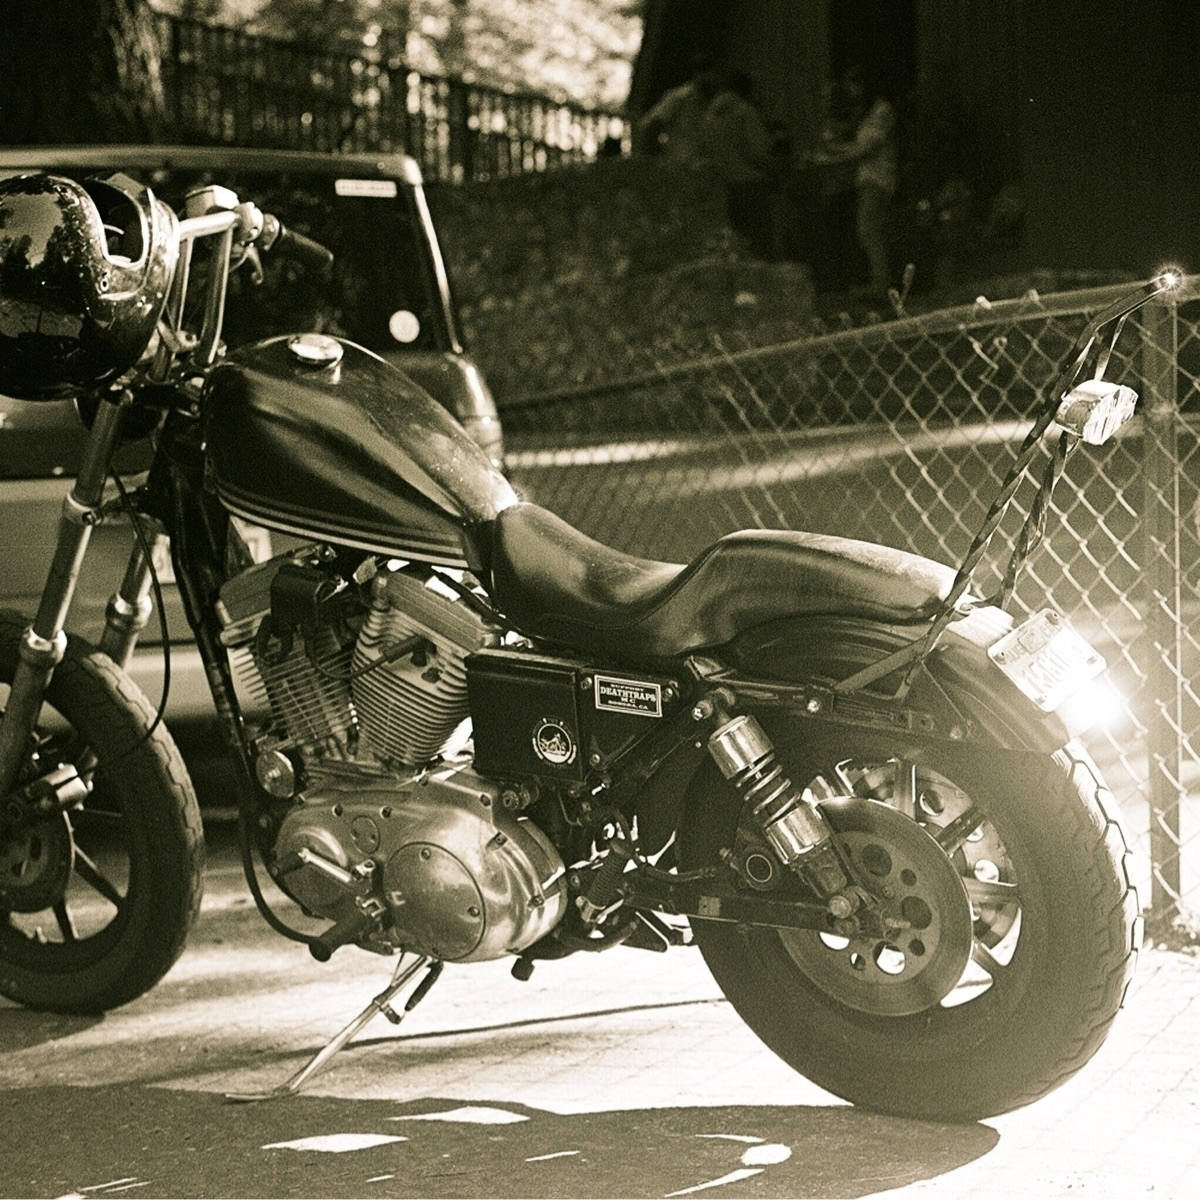 2 Wheels - 35mm, motorcycles, leicaM3 - photobiram | ello